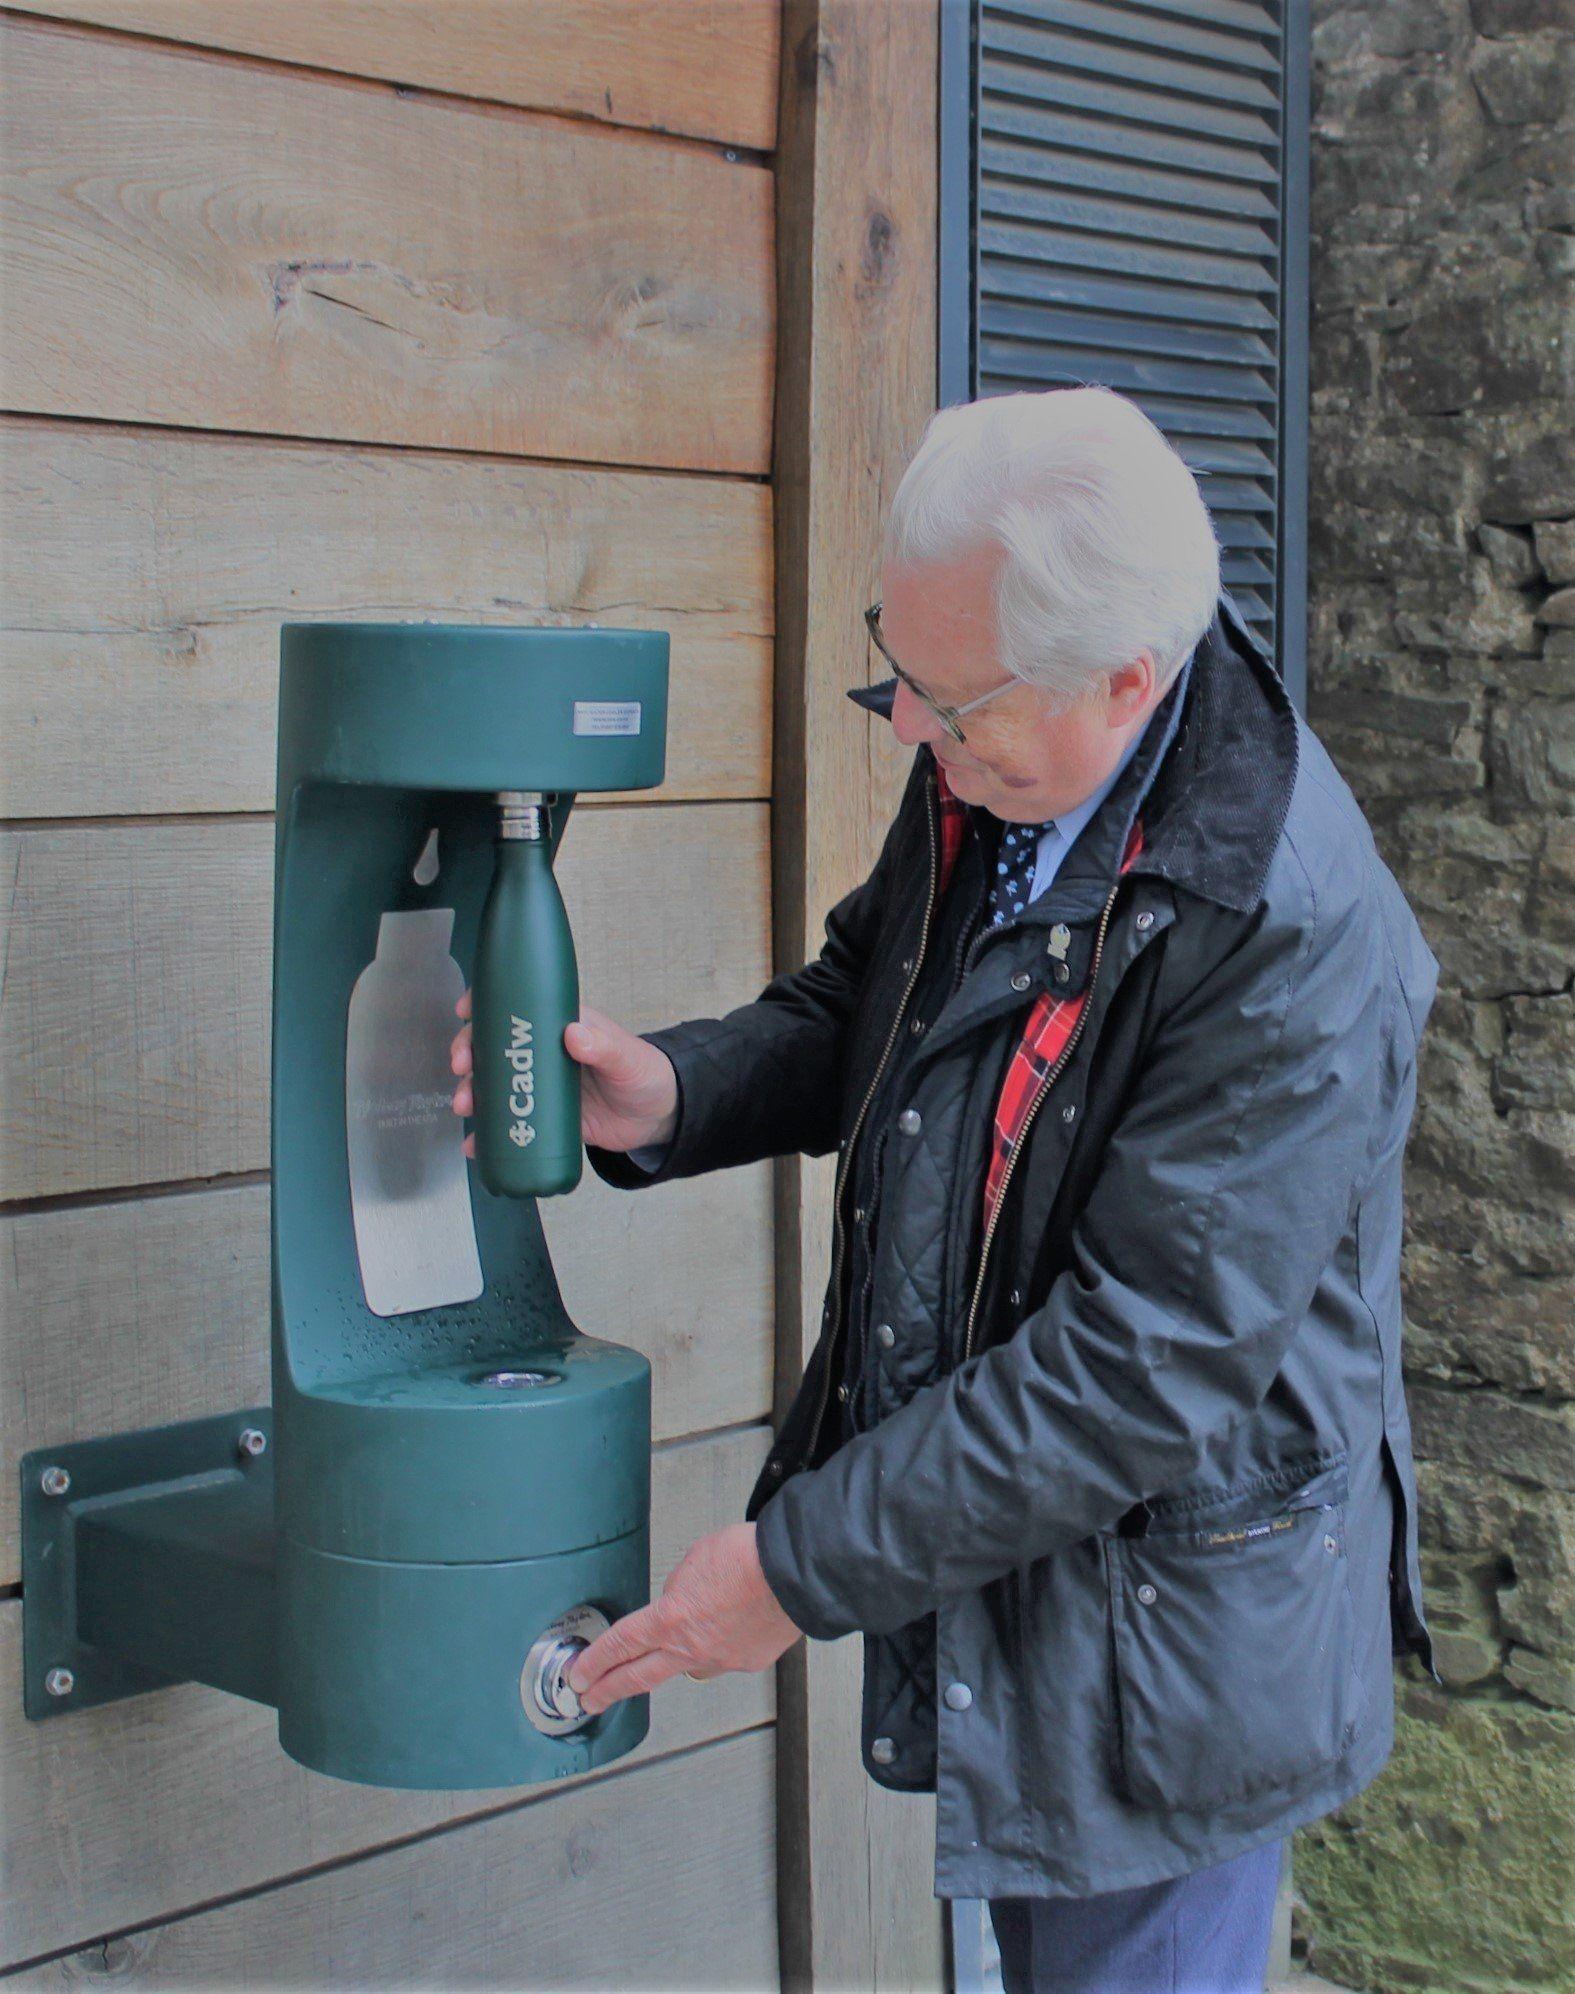 A man refilling his water bottle at a green bottle filler.